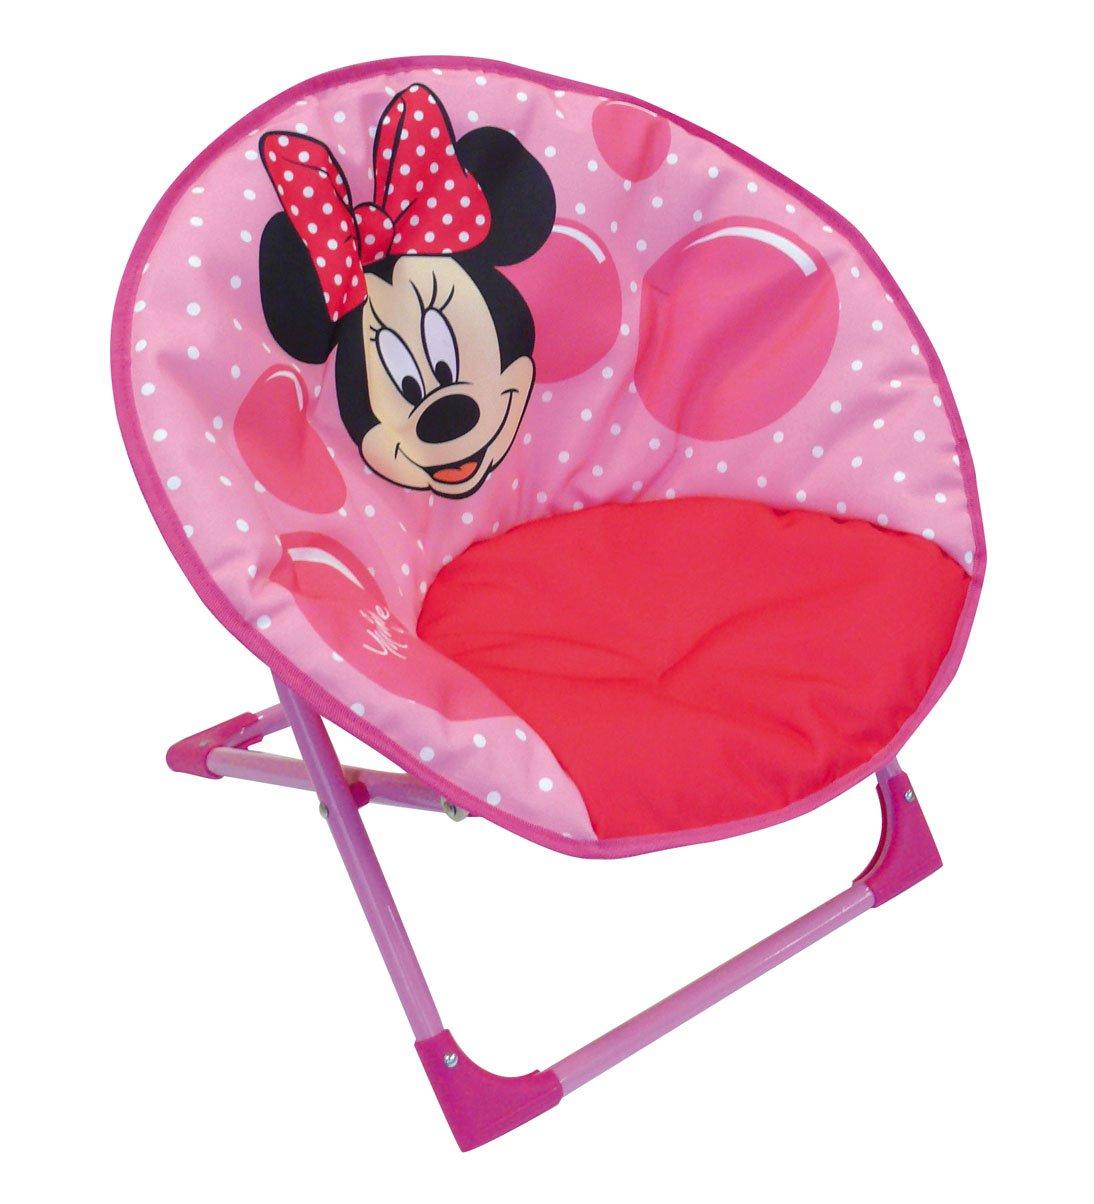 Disney Junior Cijep - 712172 Minnie Mouse Moon Chair 53 X 56 X 43 Cm